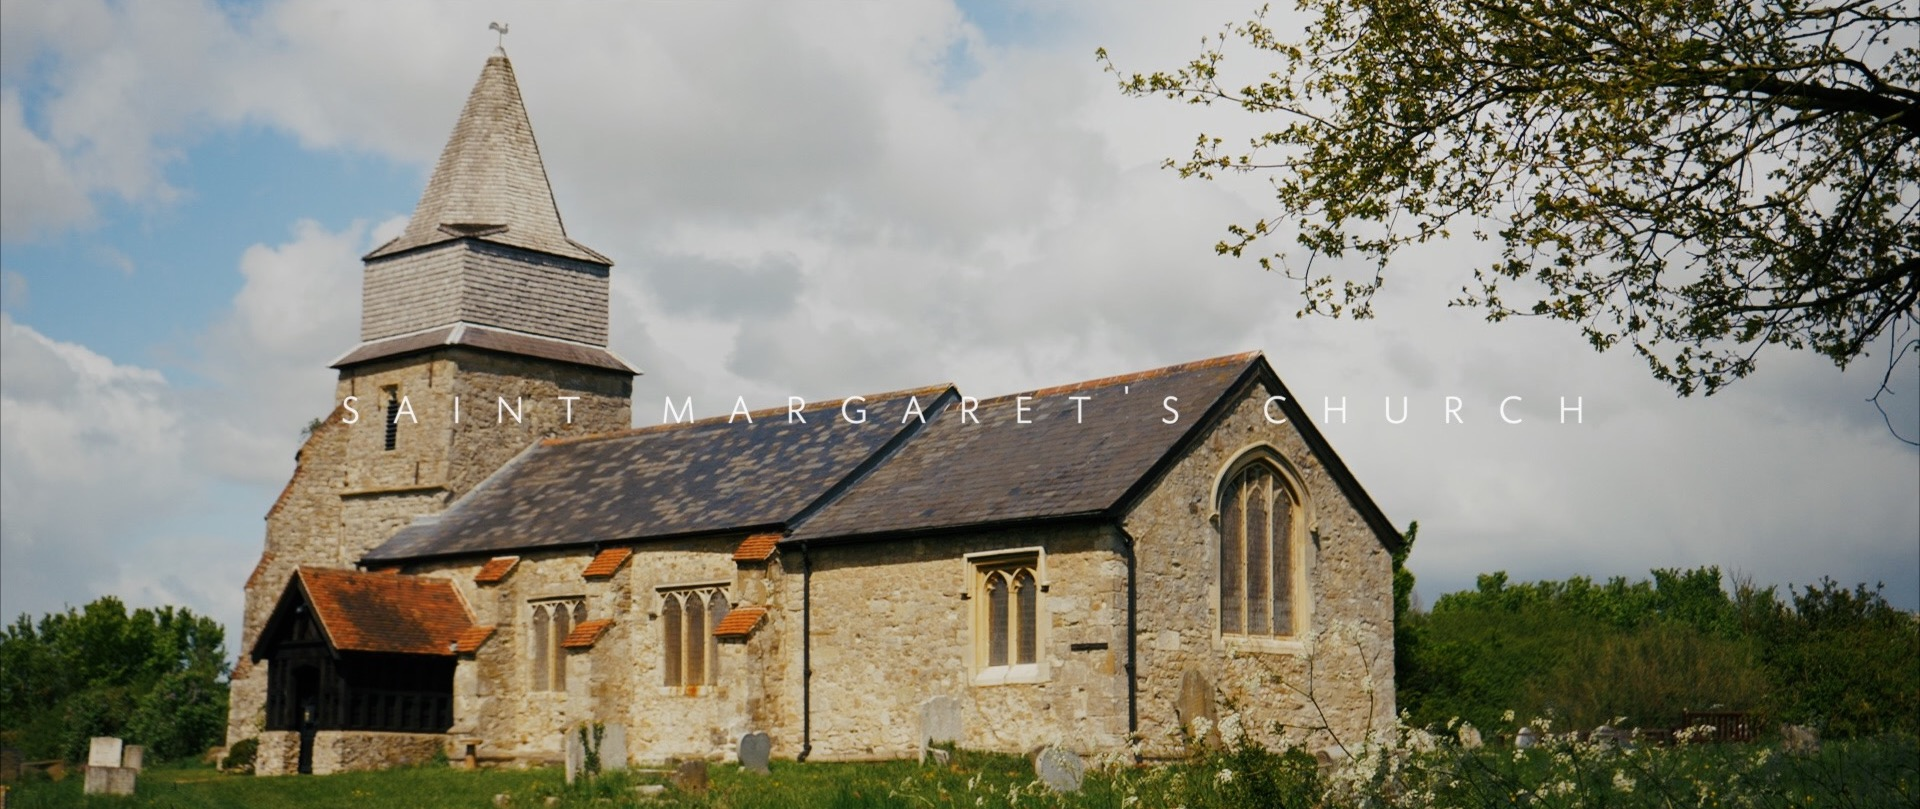 Saint Margaret's Church Pitsea Essex.jpg